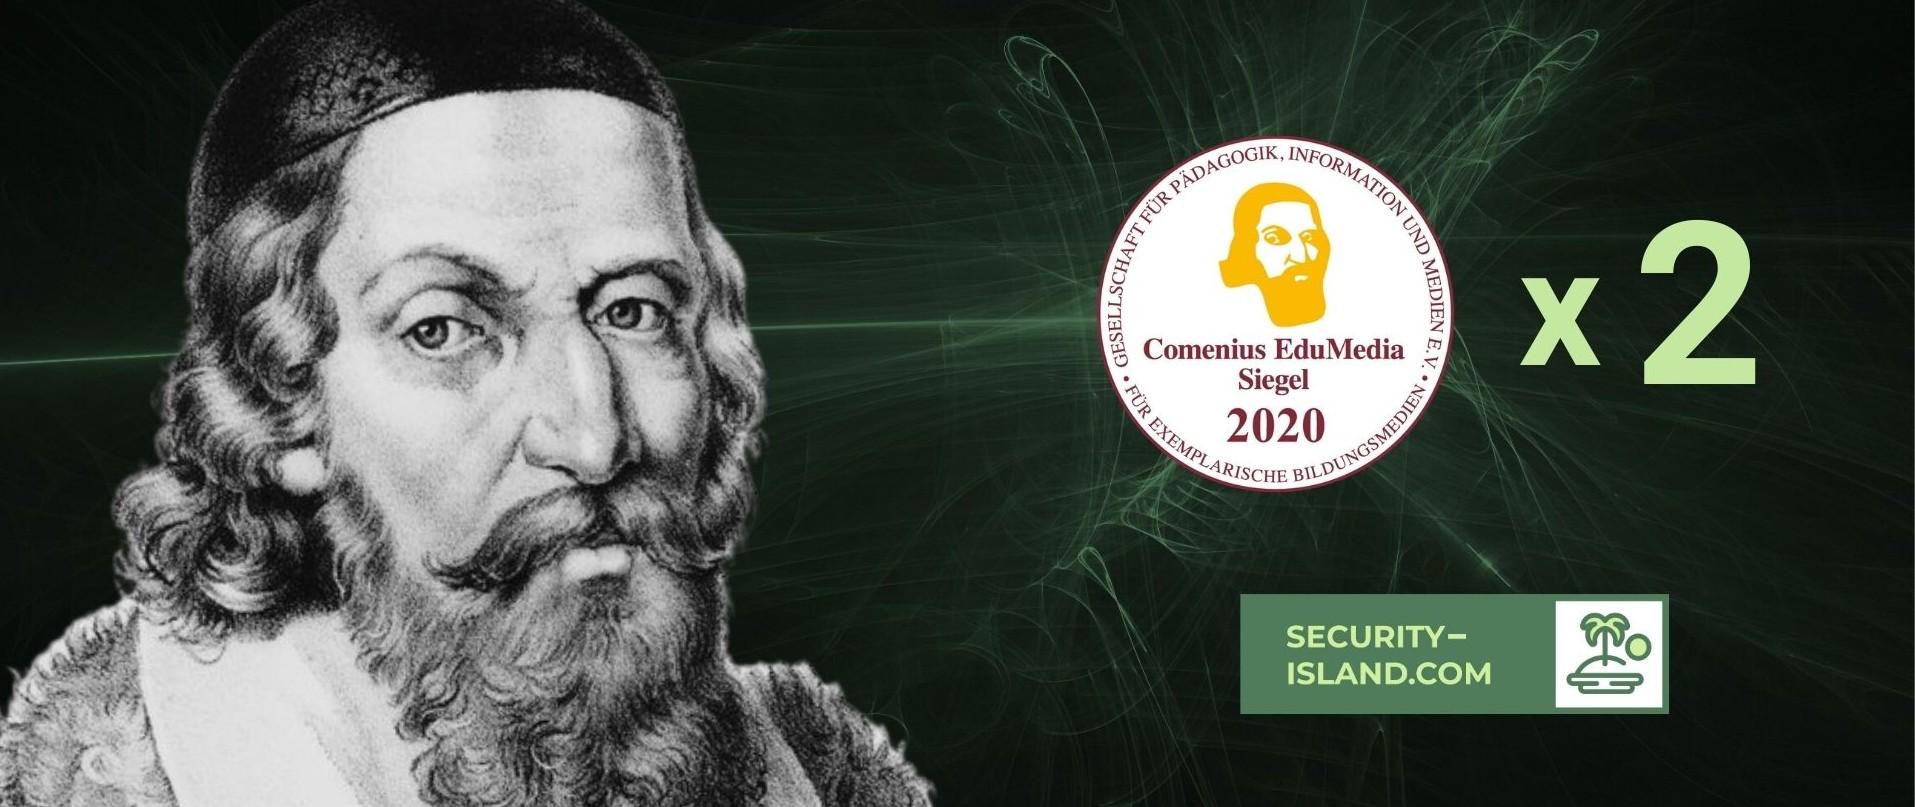 Security Island is awarded with the Comenius EduMedia Award 2020